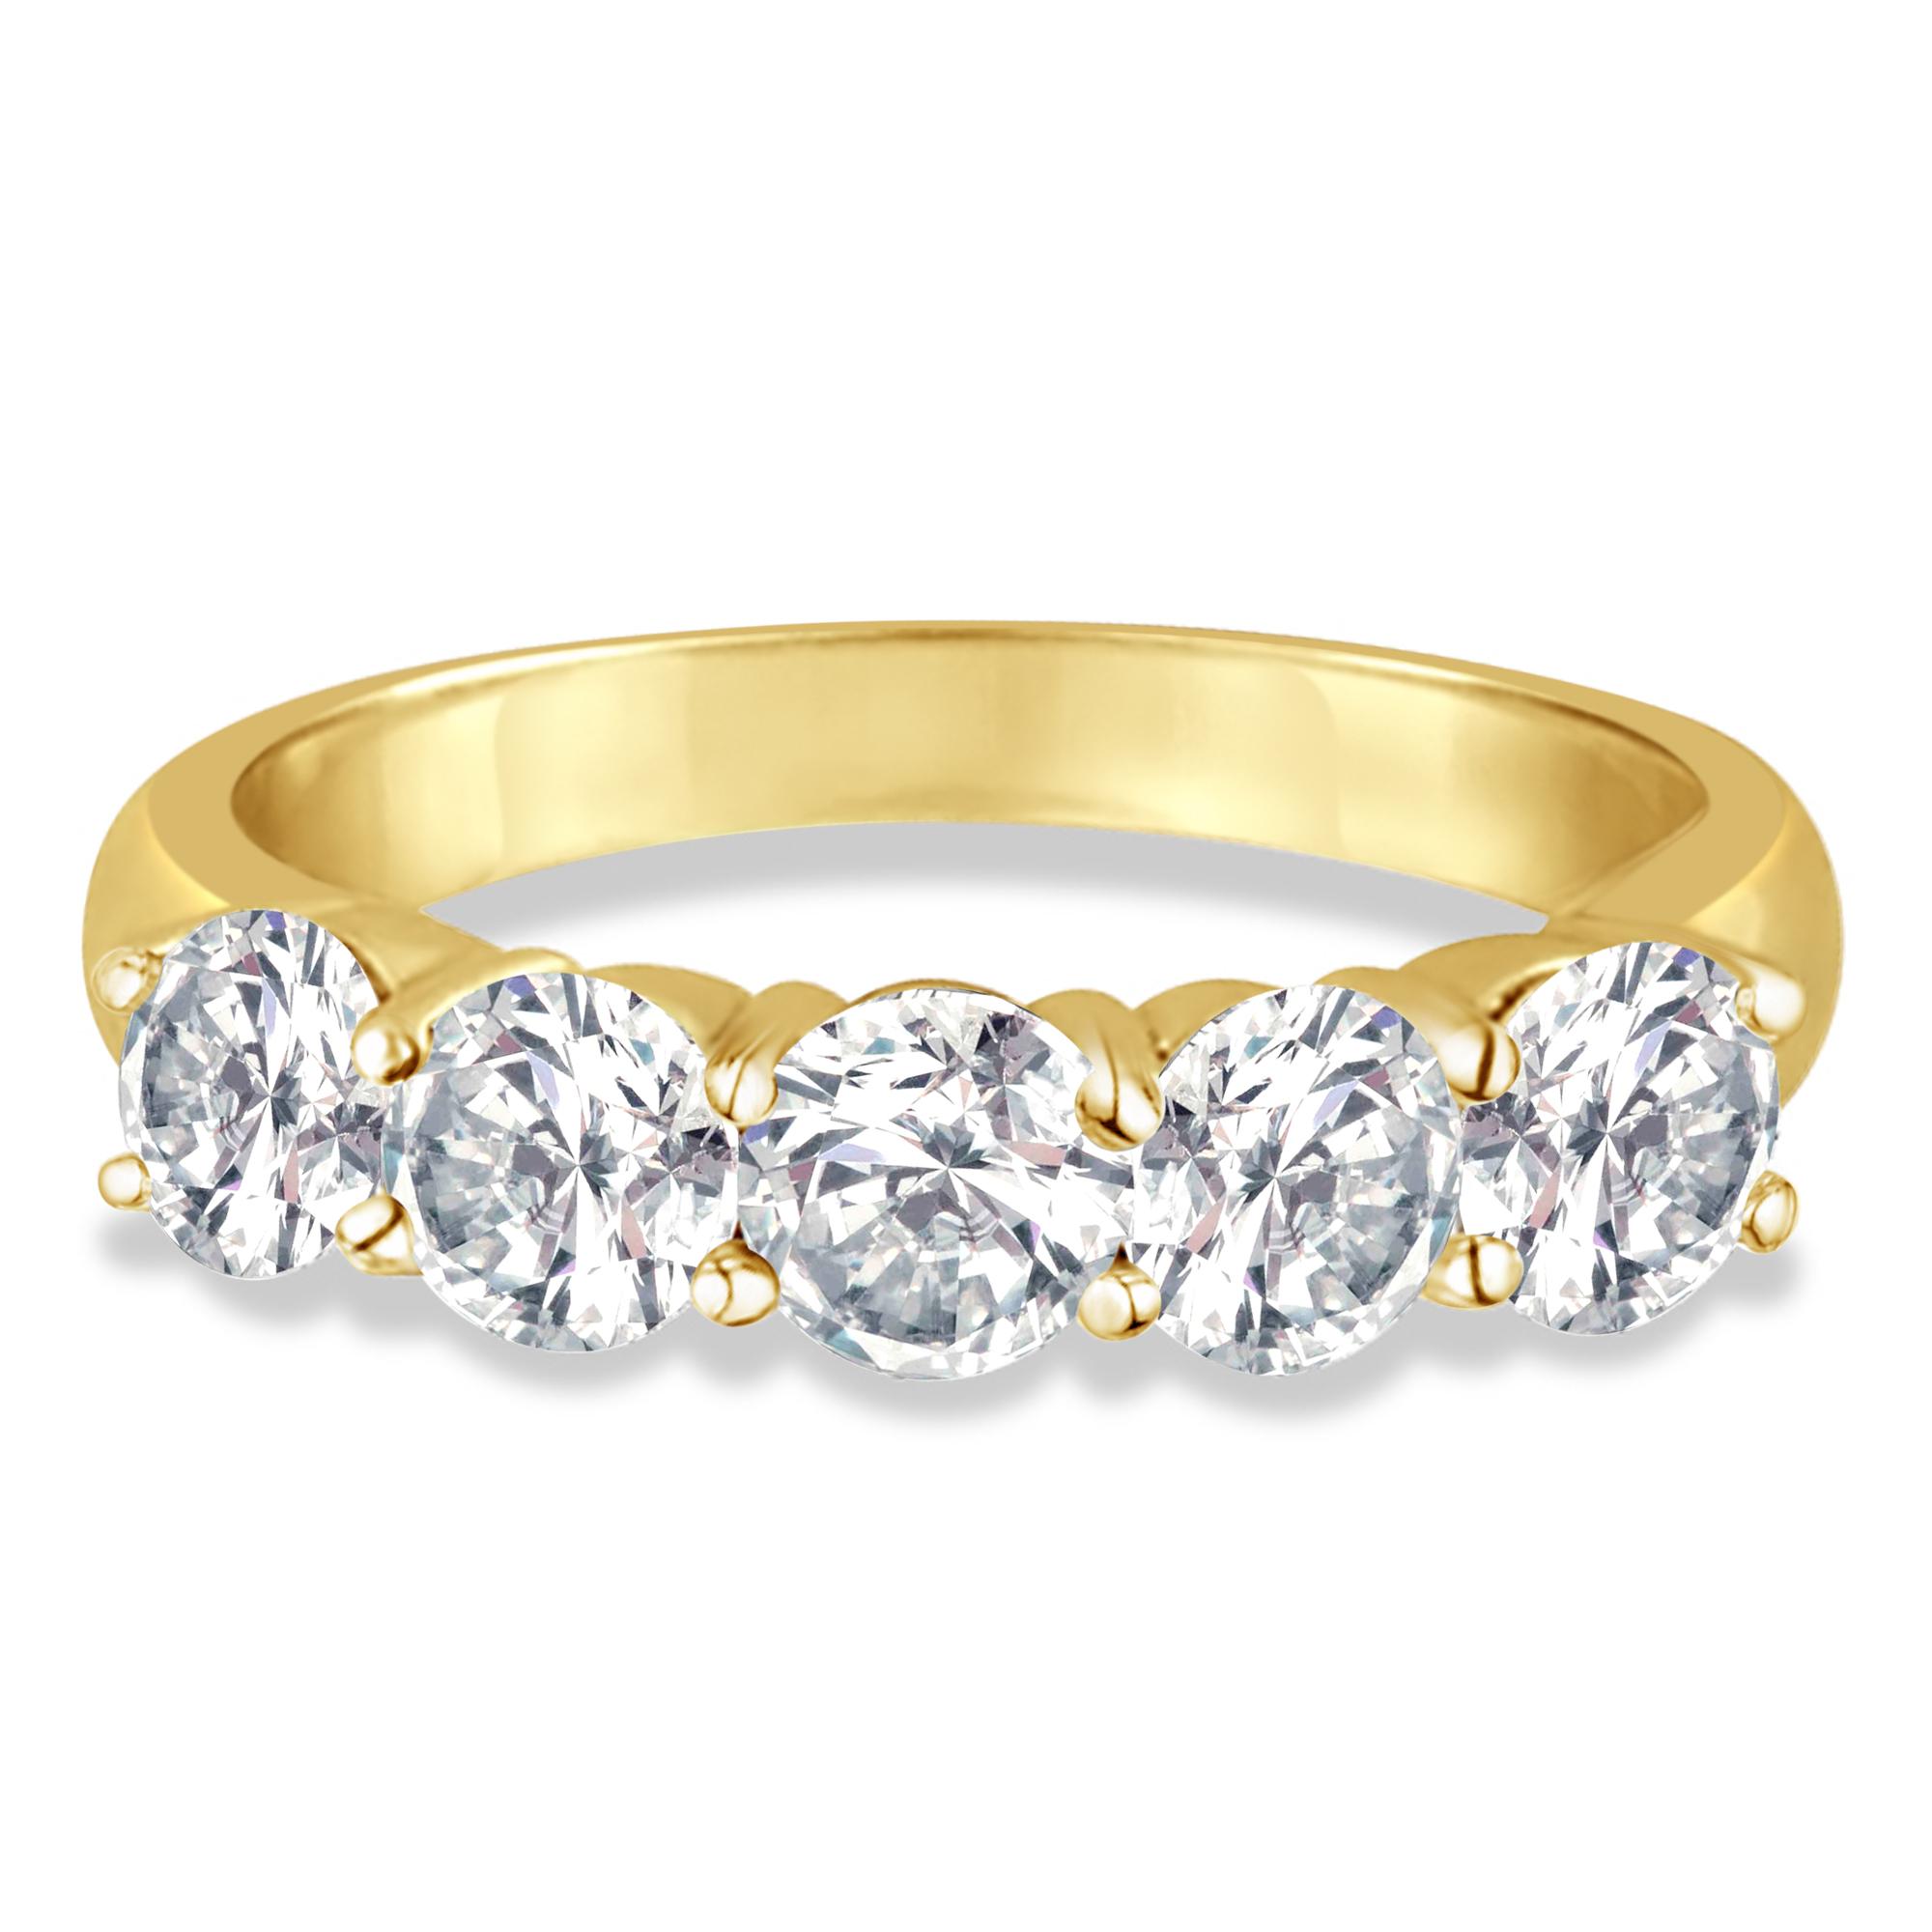 five stone diamond ring anniversary band 18k yellow gold. Black Bedroom Furniture Sets. Home Design Ideas